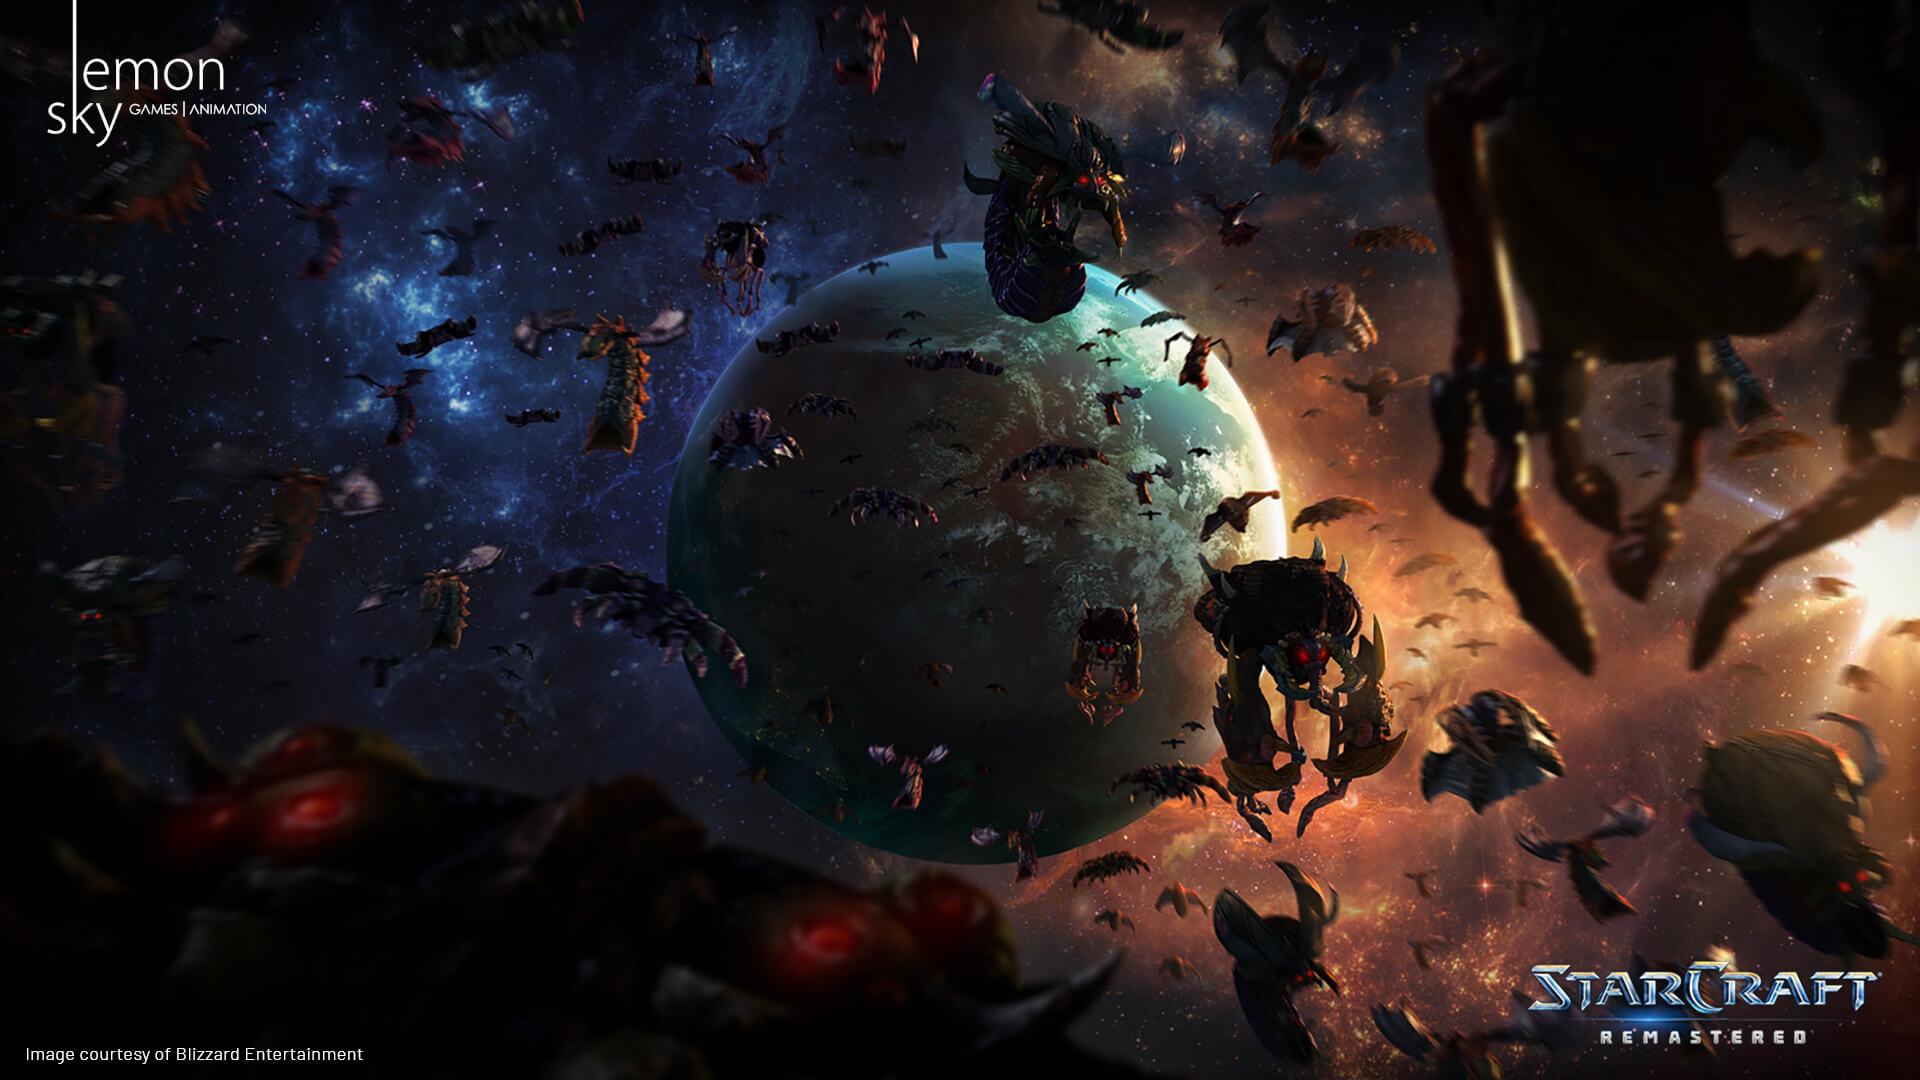 StarCraft: Remastered - Lemon Sky Studios